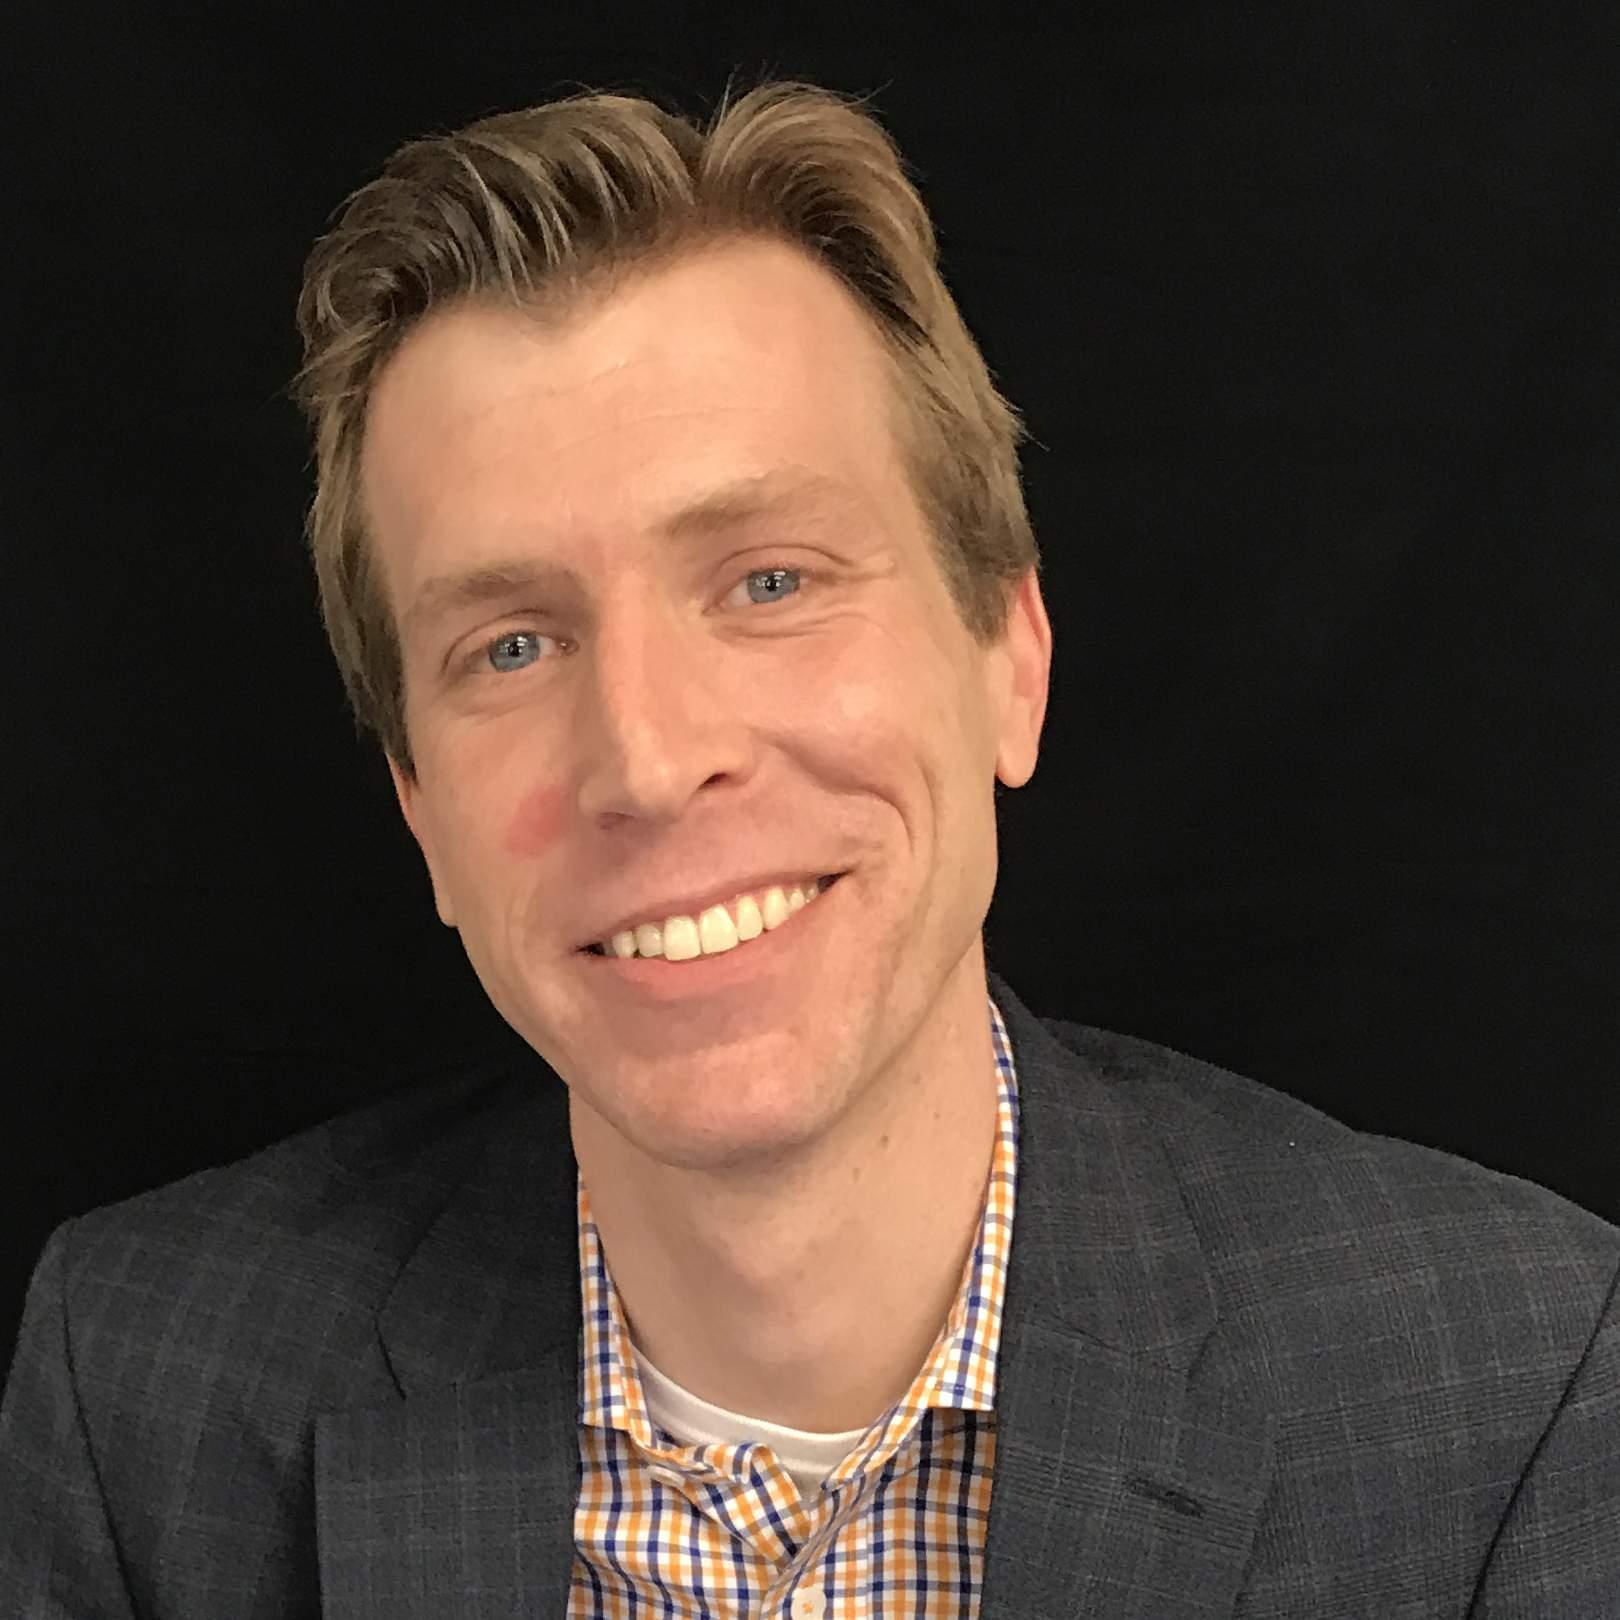 Geoff Ritter